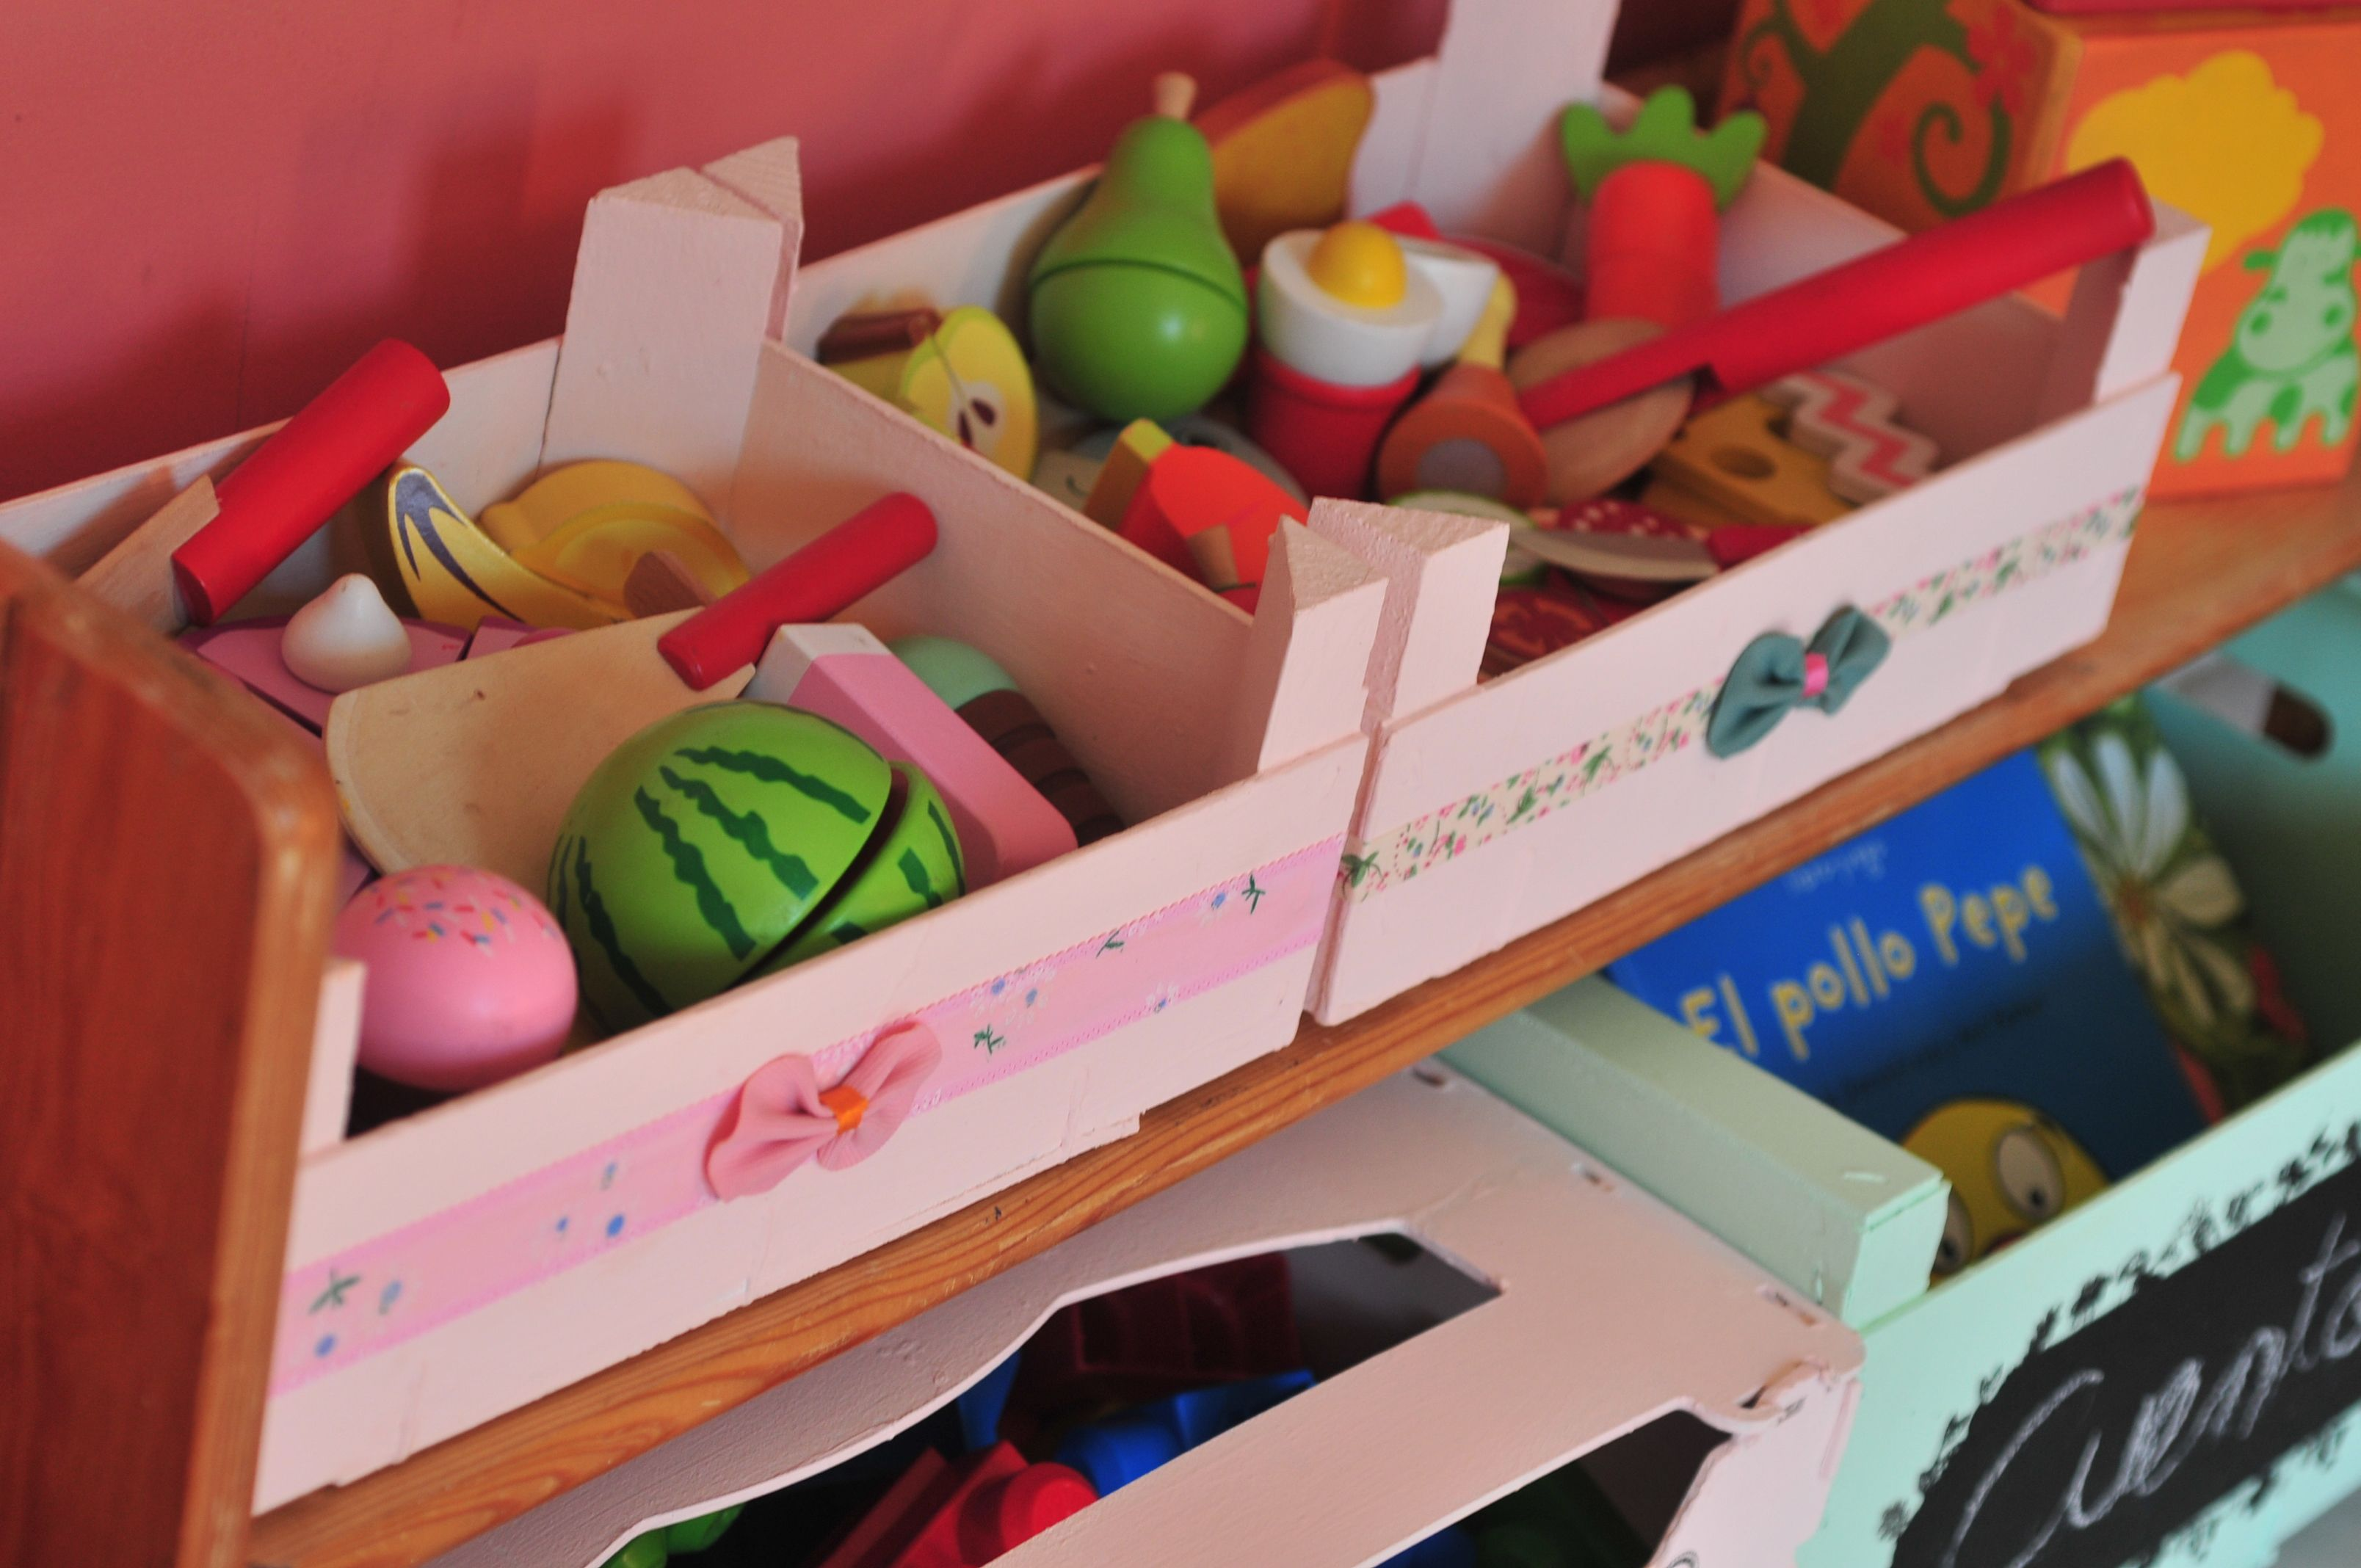 Cajas de fresas fruta madera diy reciclar cajas fresas decoradas pinterest fresa fruta - Cajas fruta decoracion ...